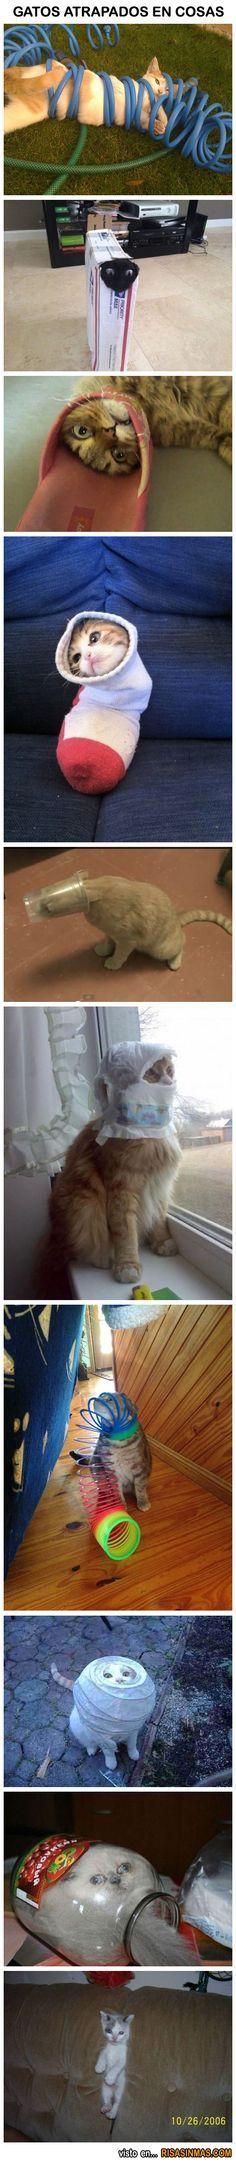 Gatos atrapados dentro de cosas.